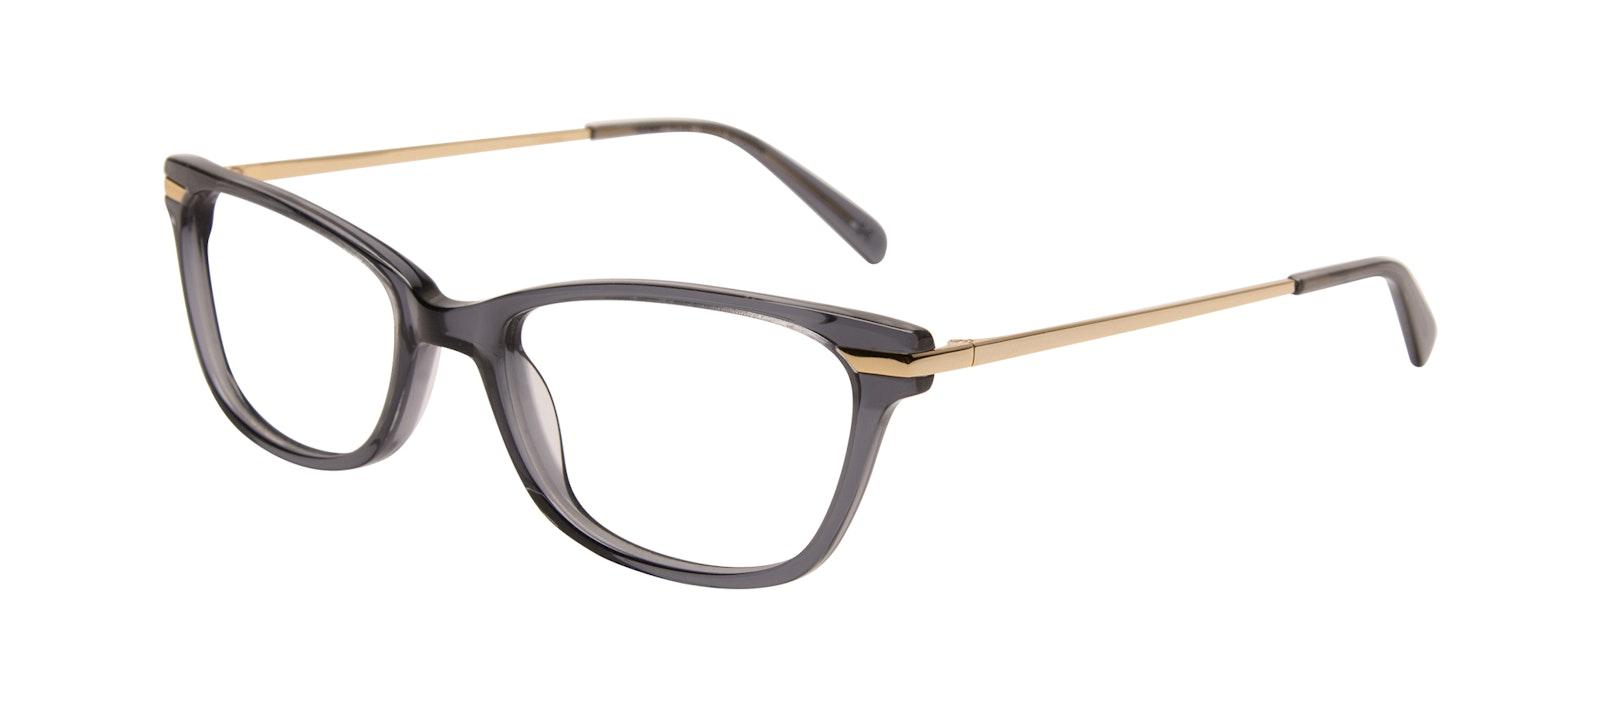 Affordable Fashion Glasses Rectangle Eyeglasses Women Comet Plus Gold Shadow Tilt